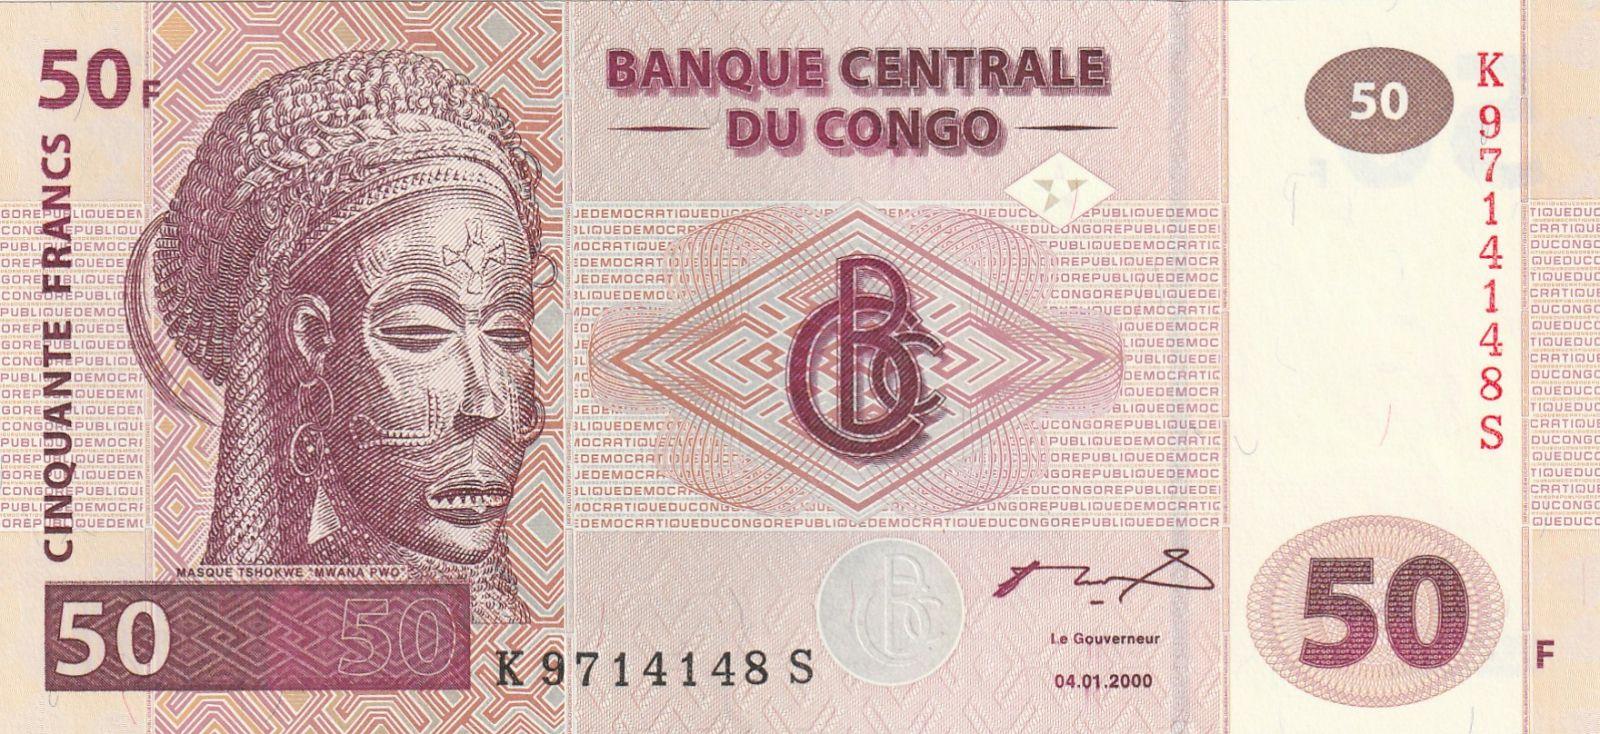 50 Franc, Kongo, 2000